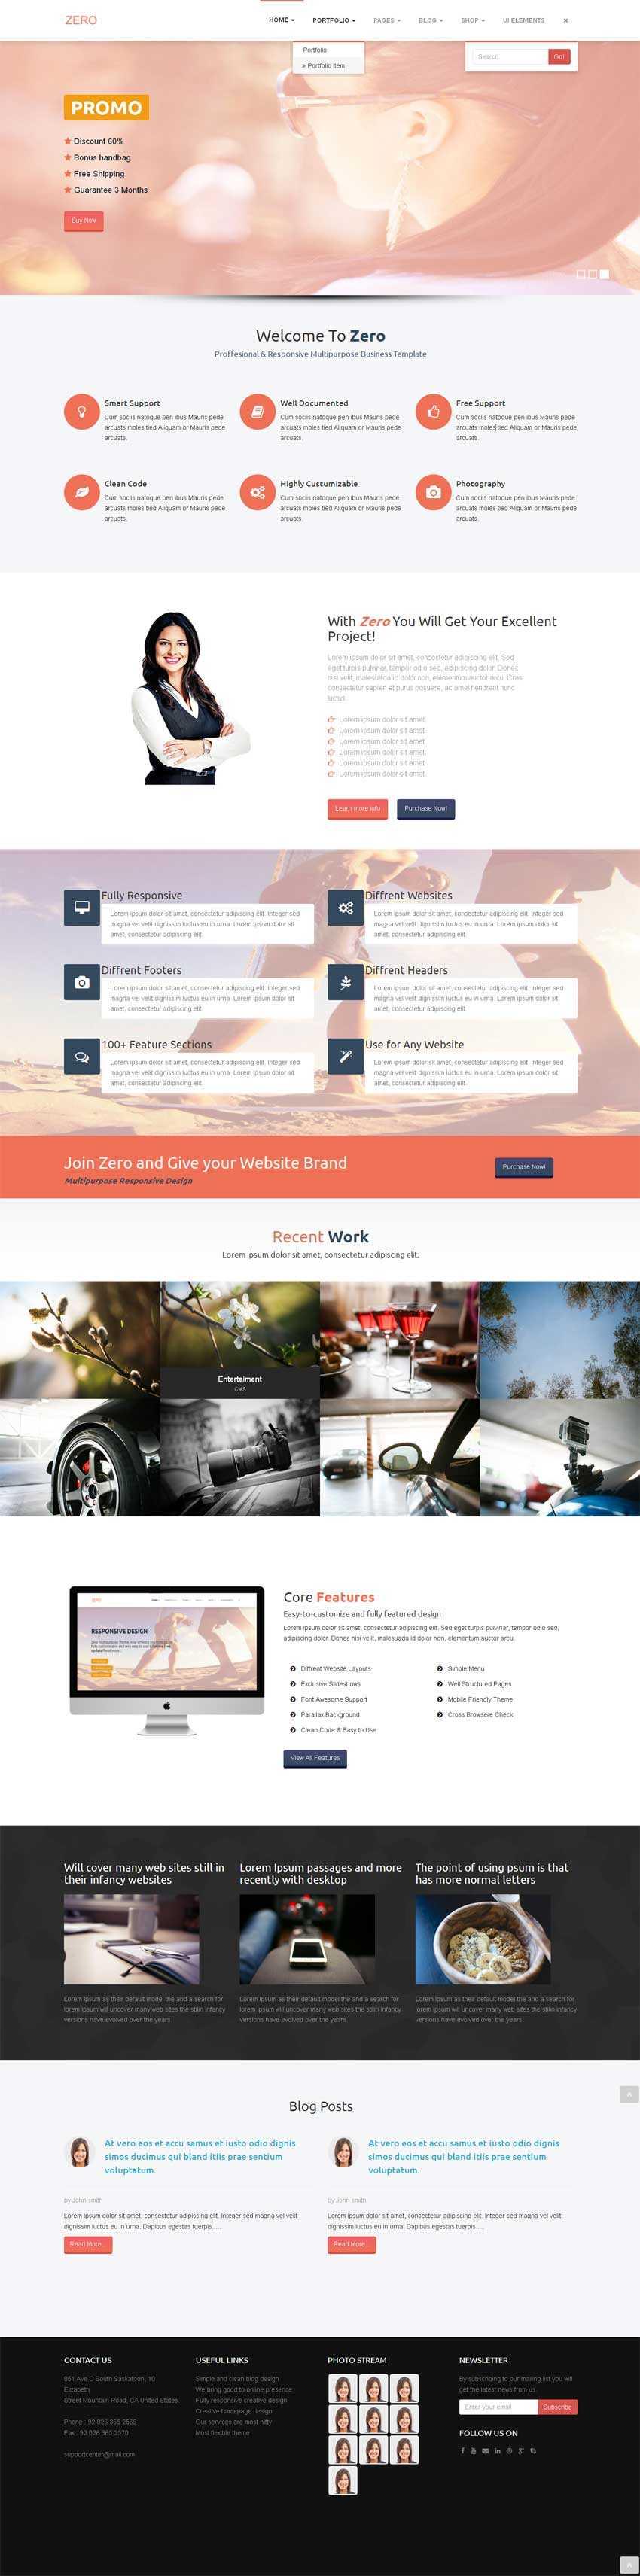 html5响应式企业主题网站模板源码下载